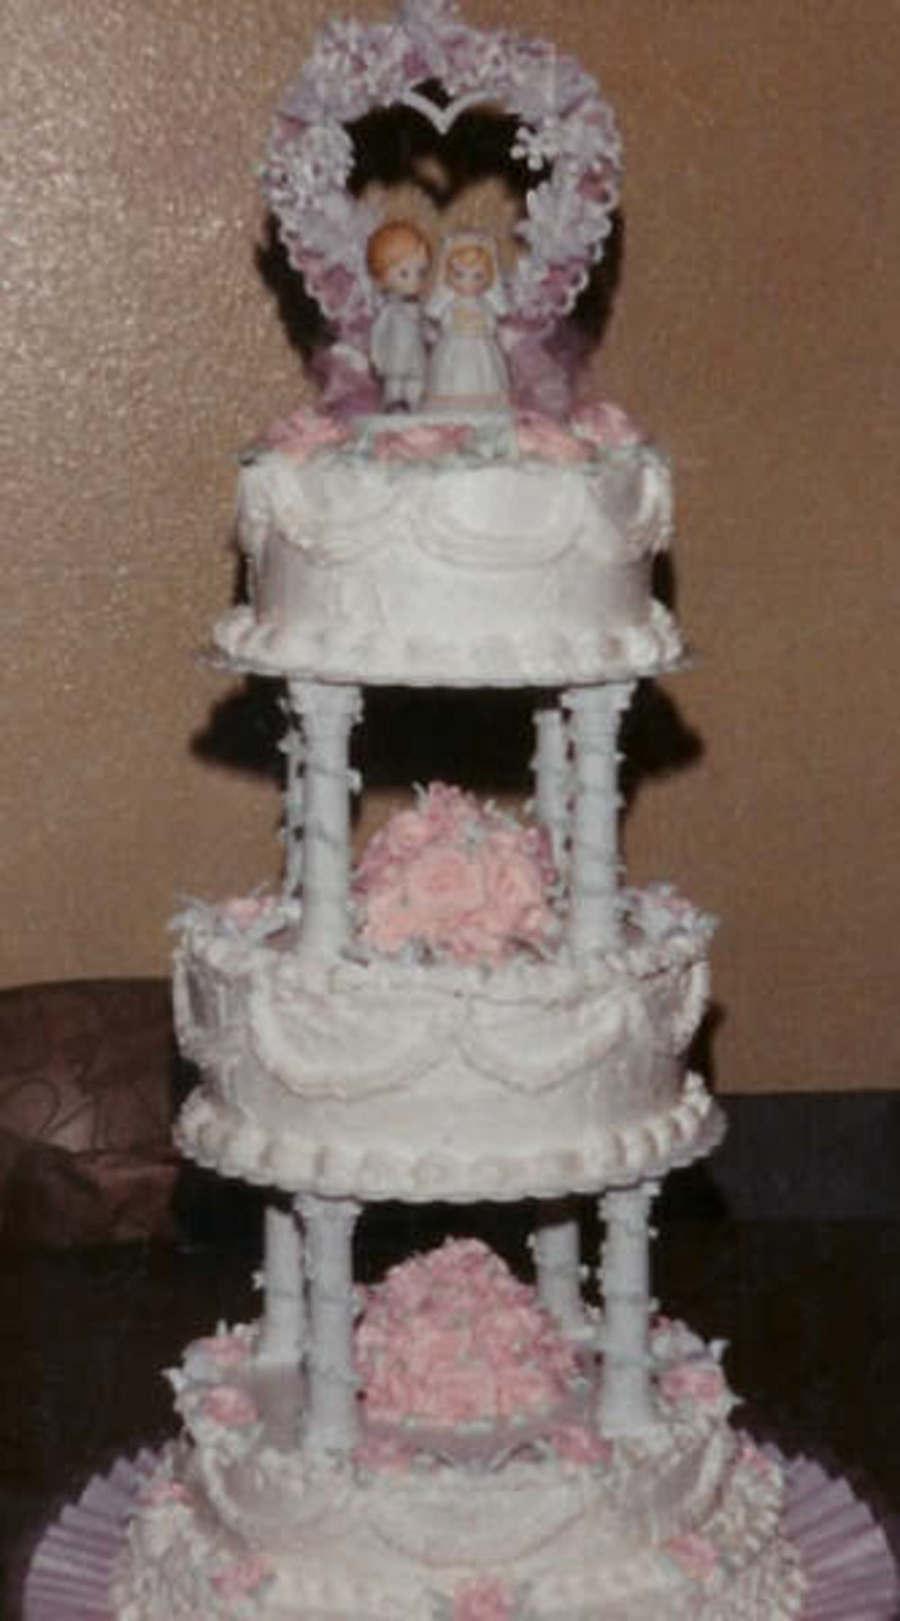 Precious Moments 3 Tier Stacked W Pillars Round White Cake